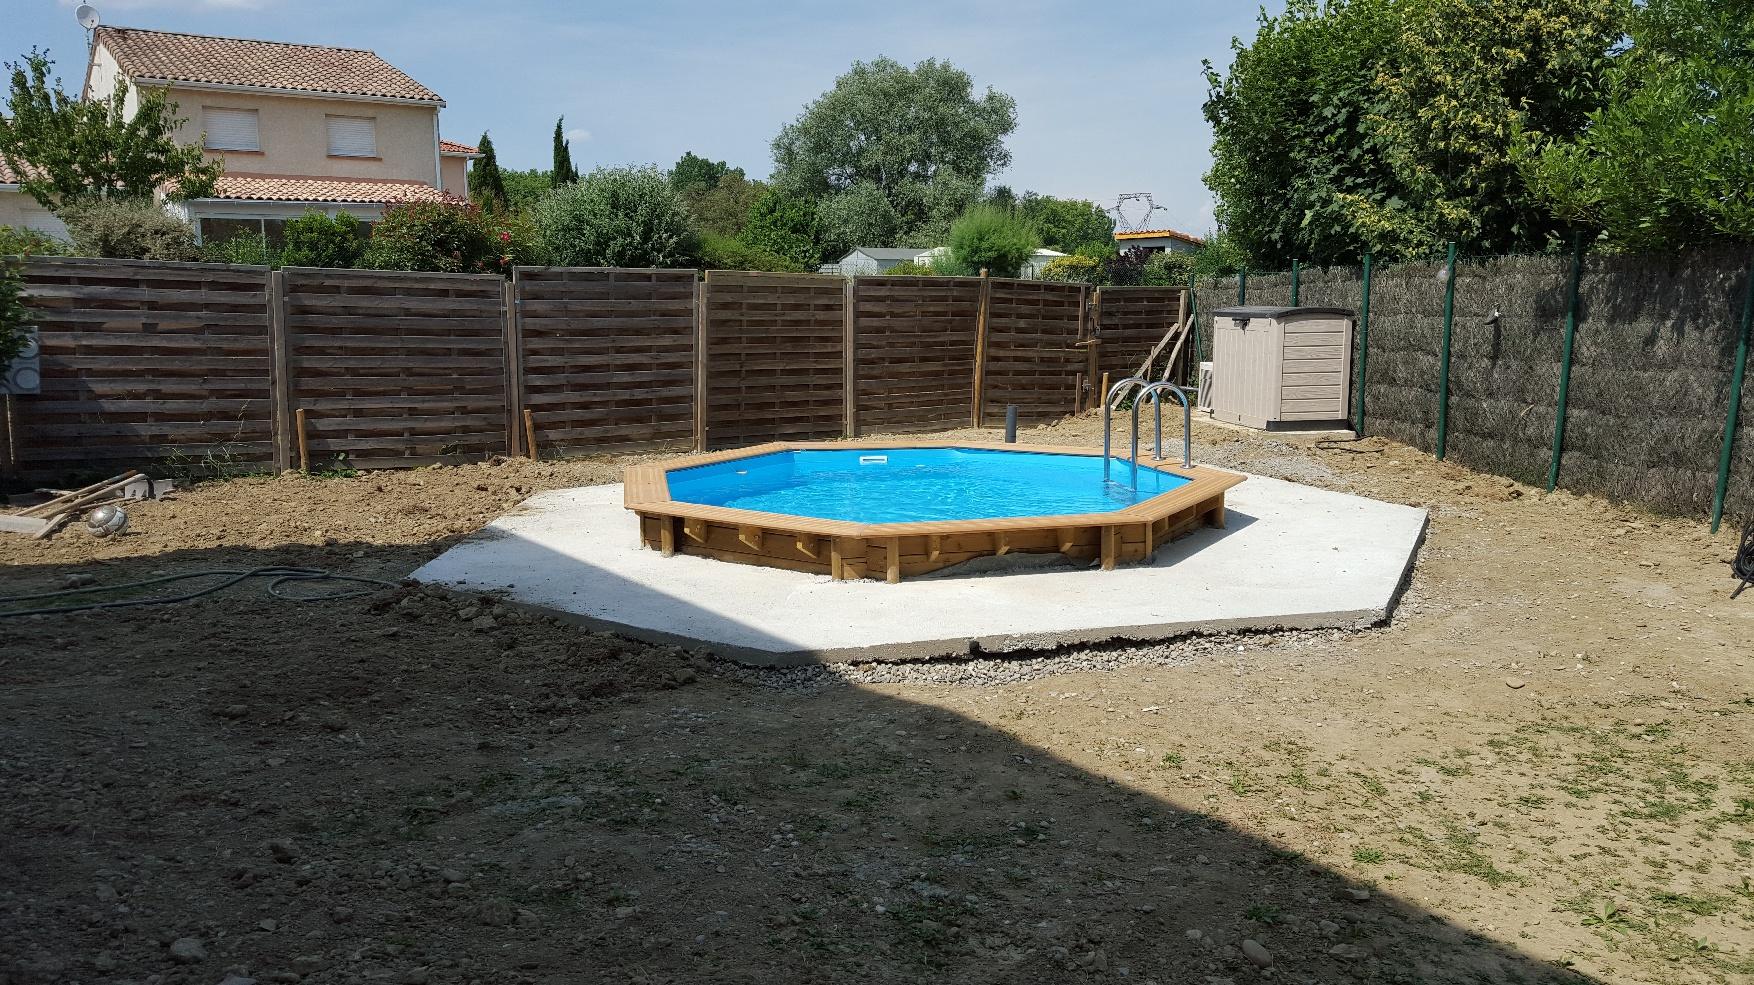 Piscine Bois Semi Enterree Hexagonale A Portet Sur Garonne